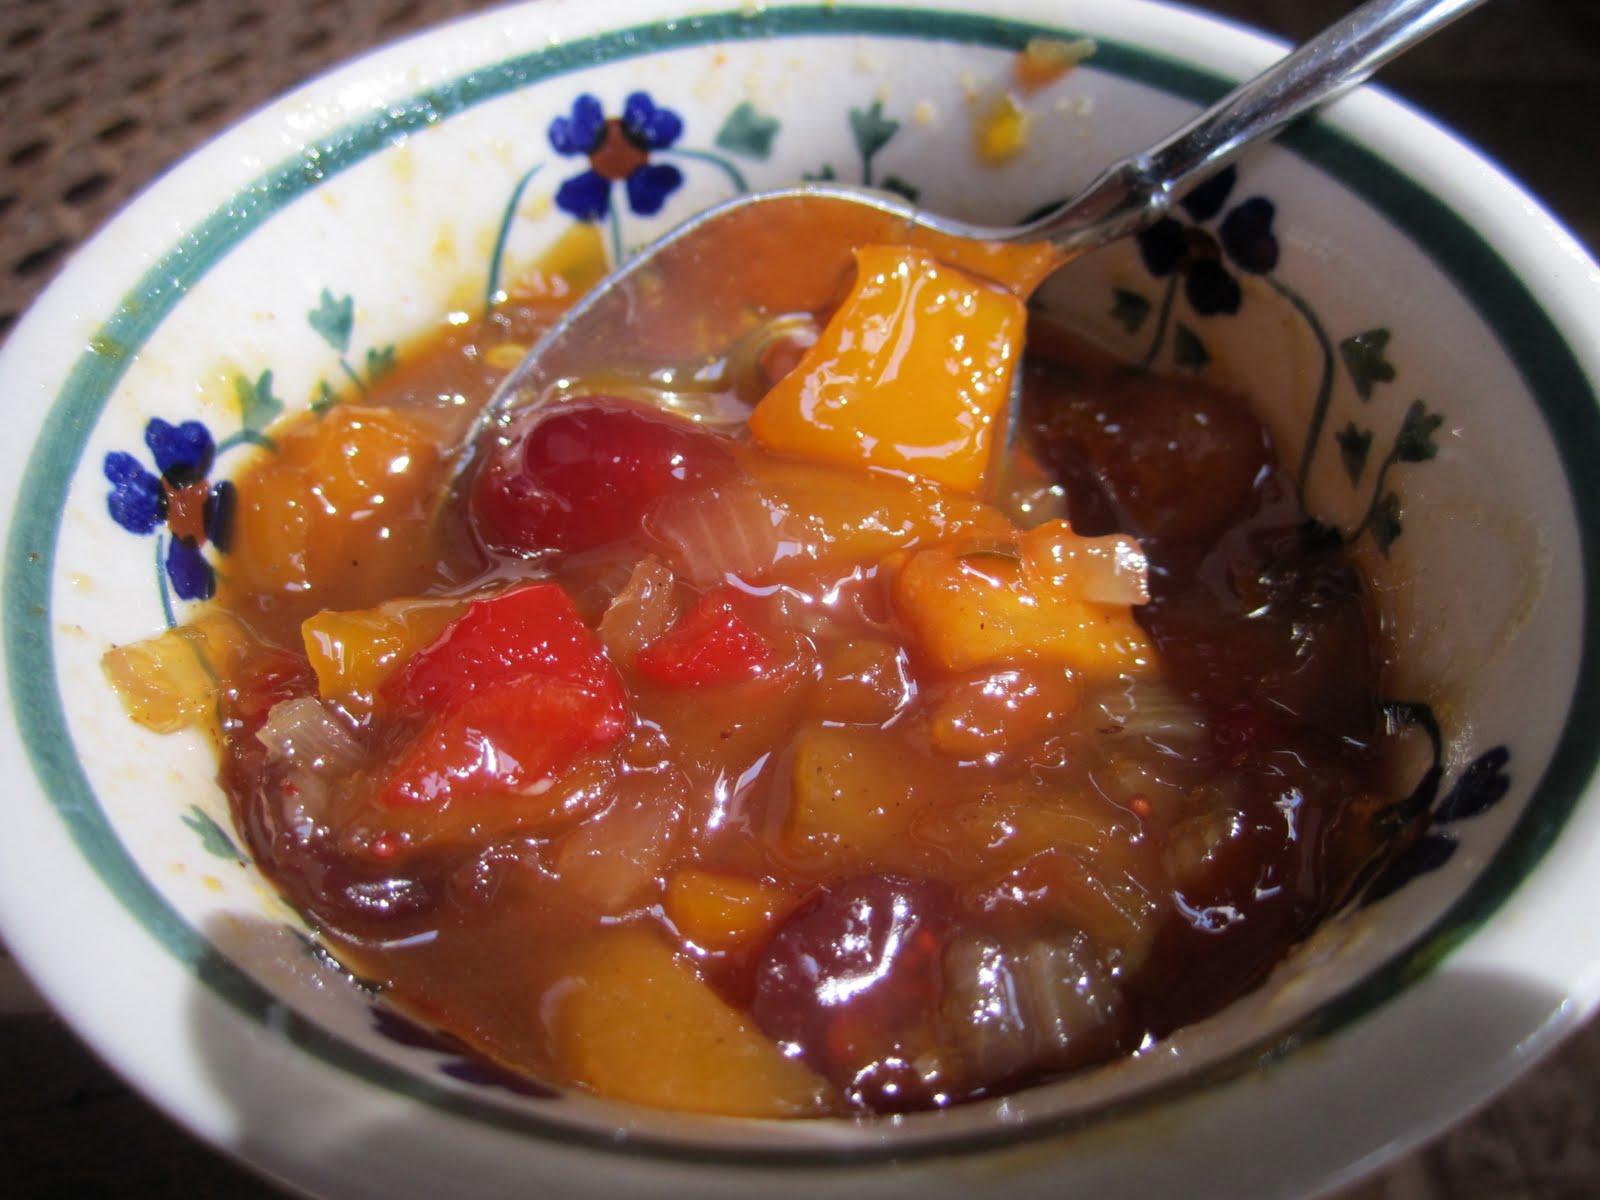 ... mango chutney chicken with mango chutney sauce british style patatas